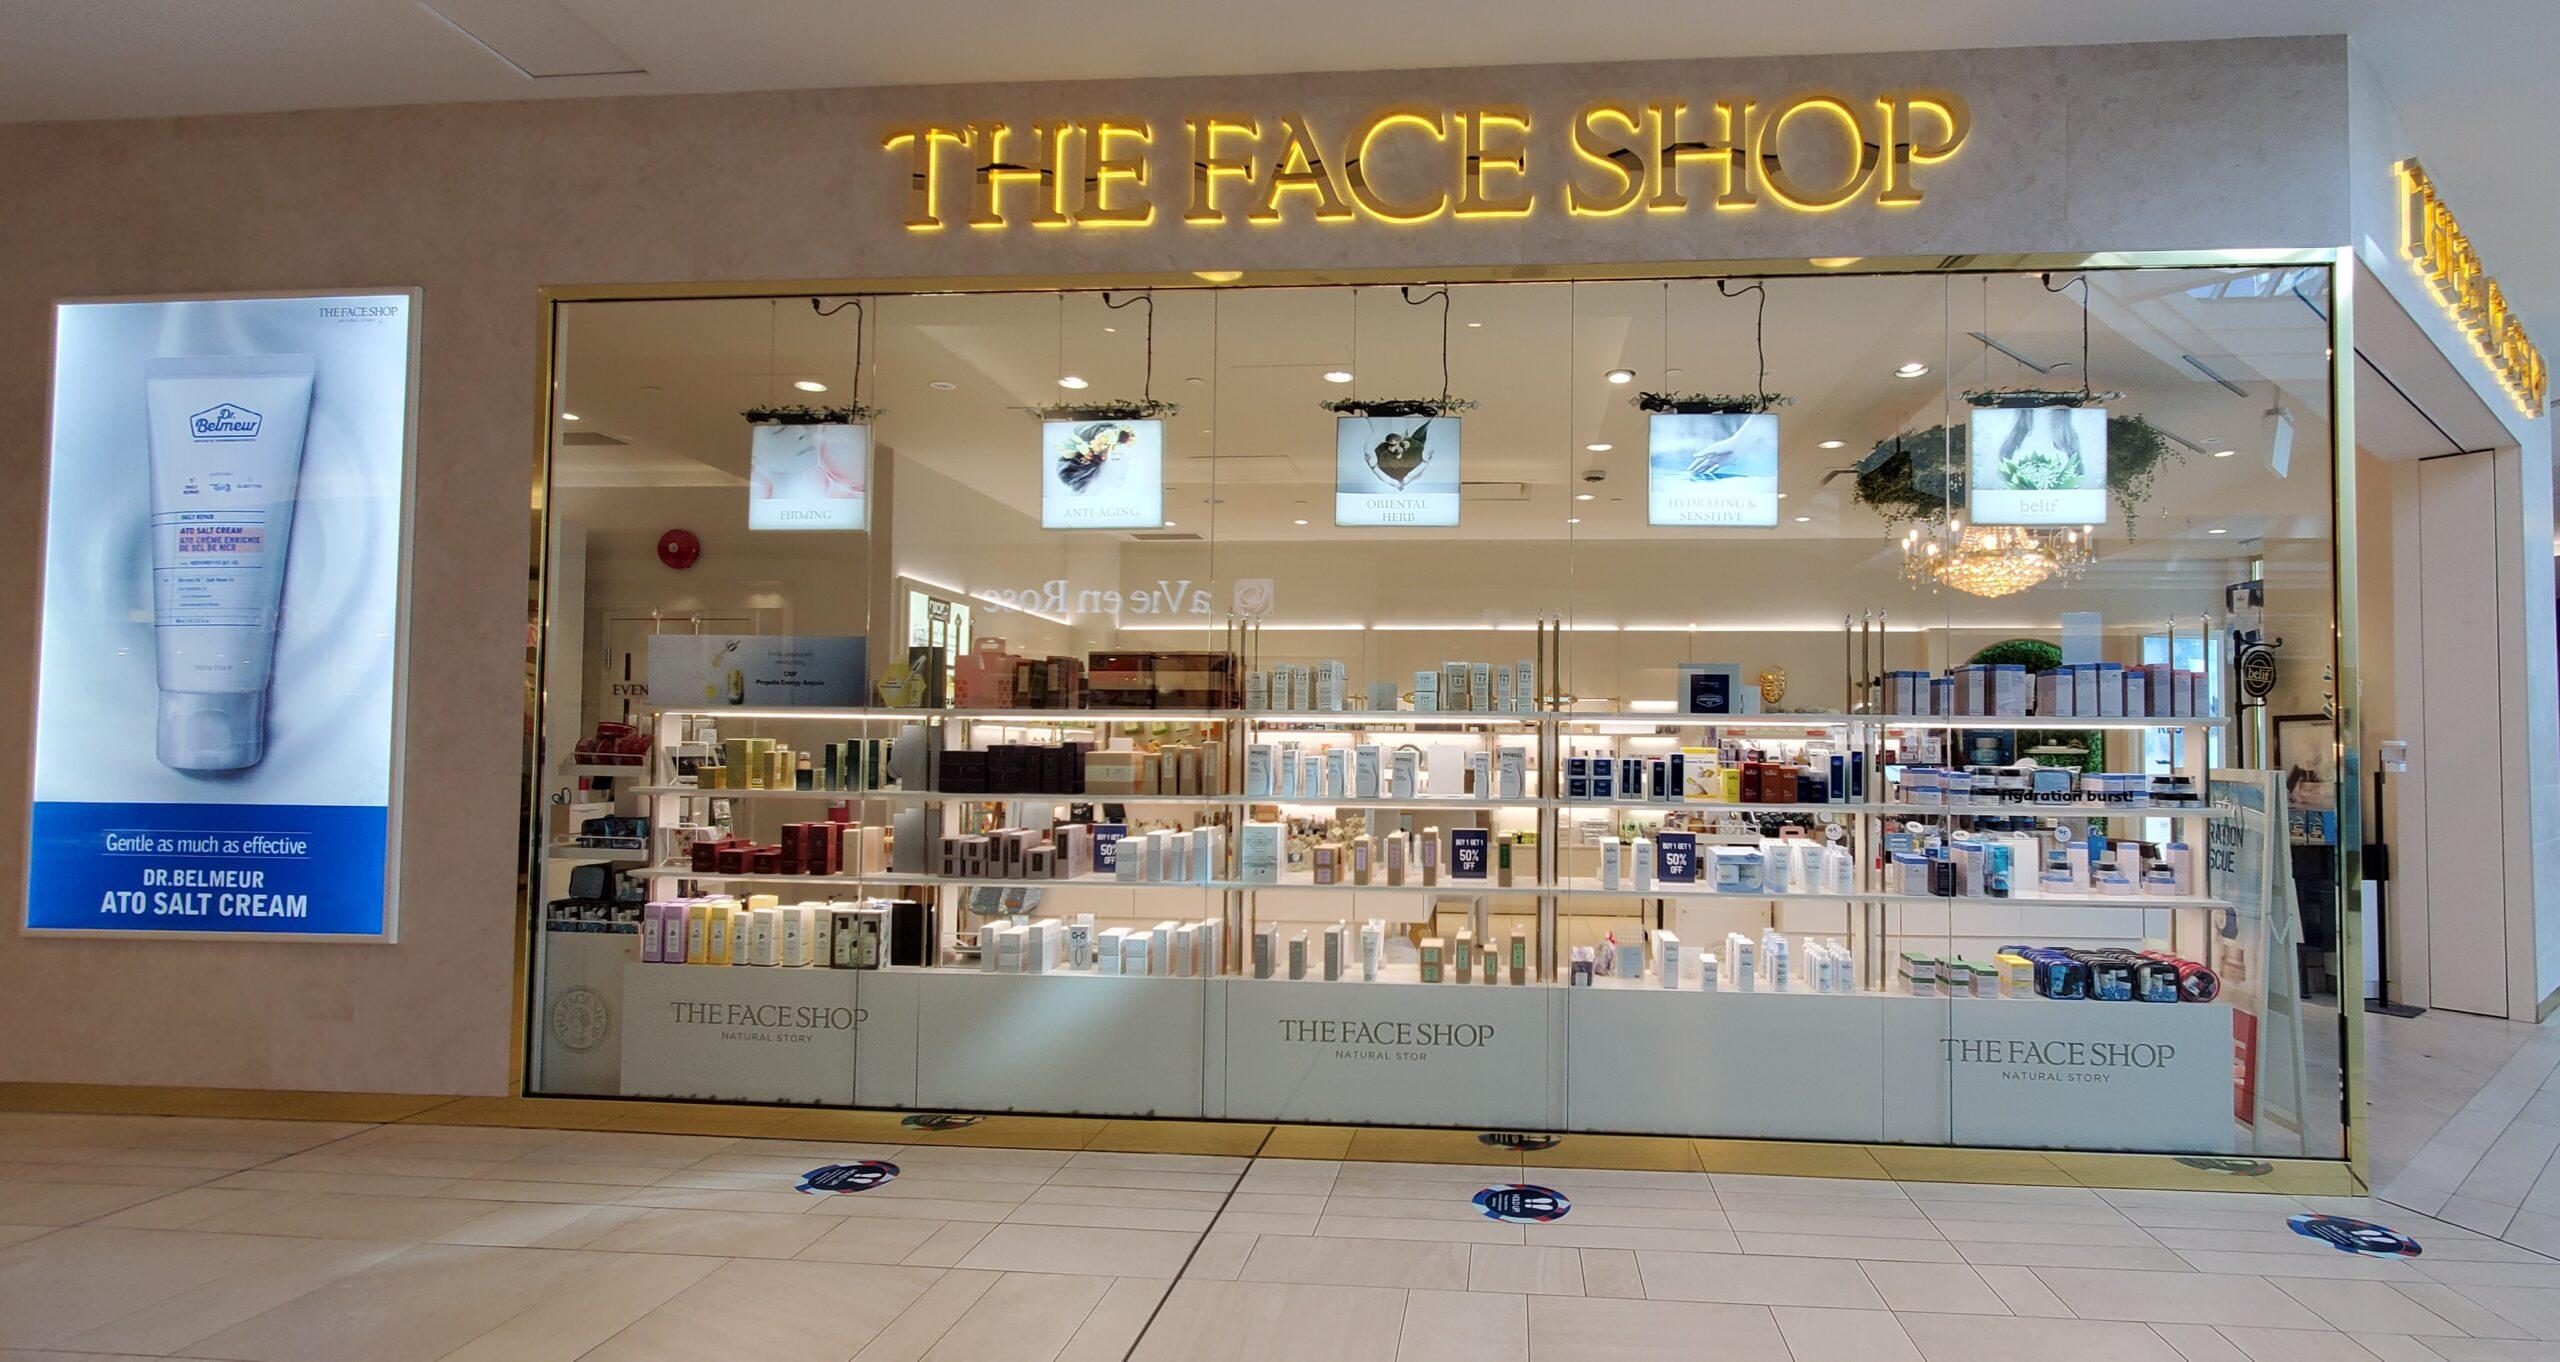 The Face Shop at CF Richmond Centre.